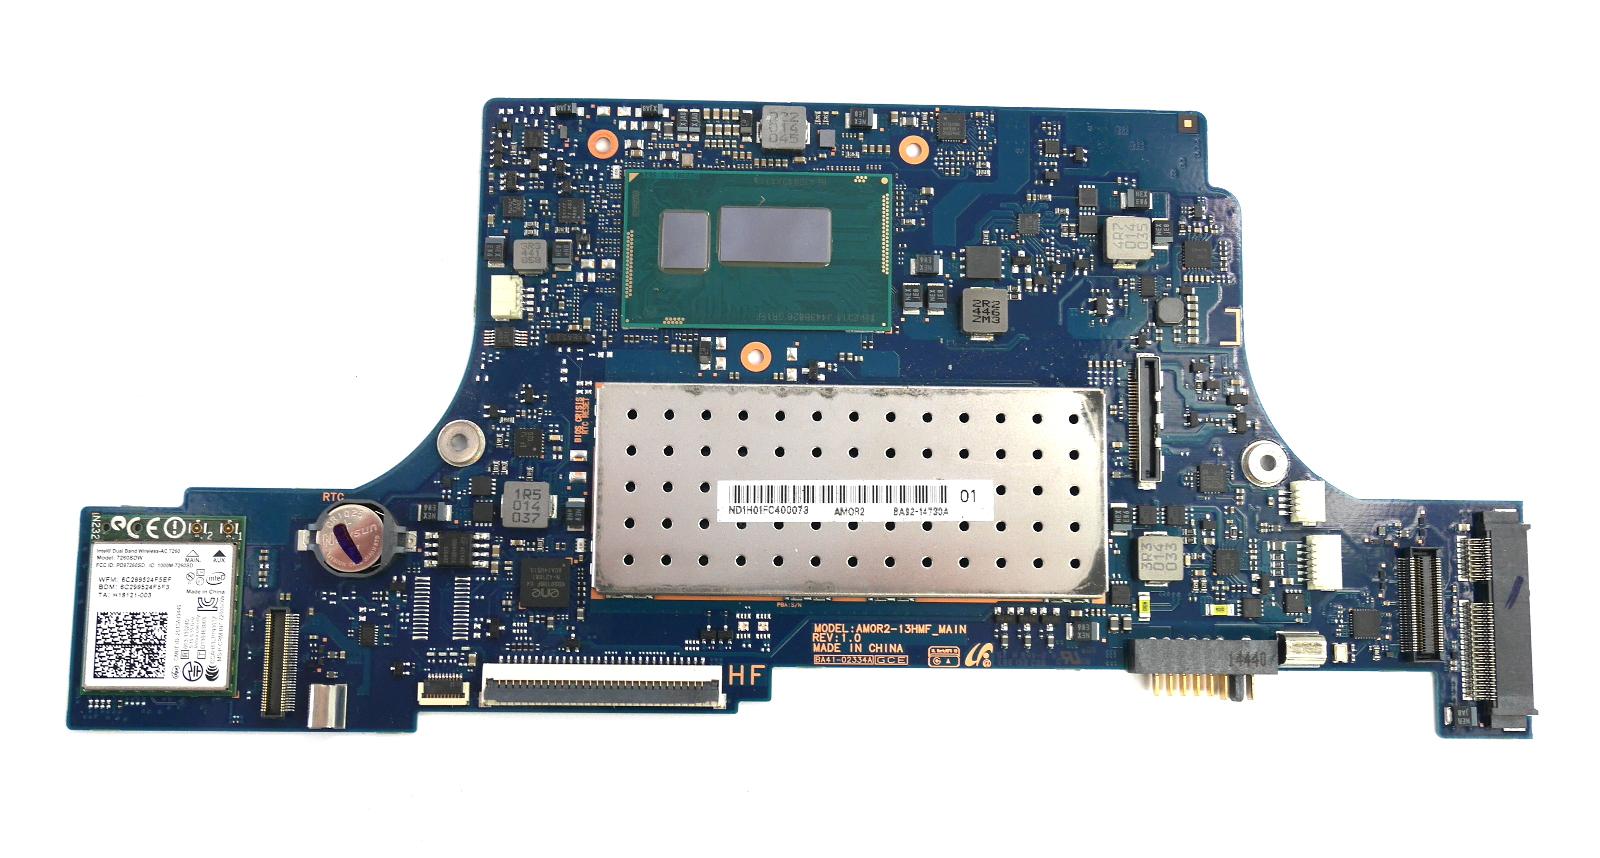 Samsung BA92-14730 900X NP900X3G Motherboard with BGA Intel Core i5-4210U CPU